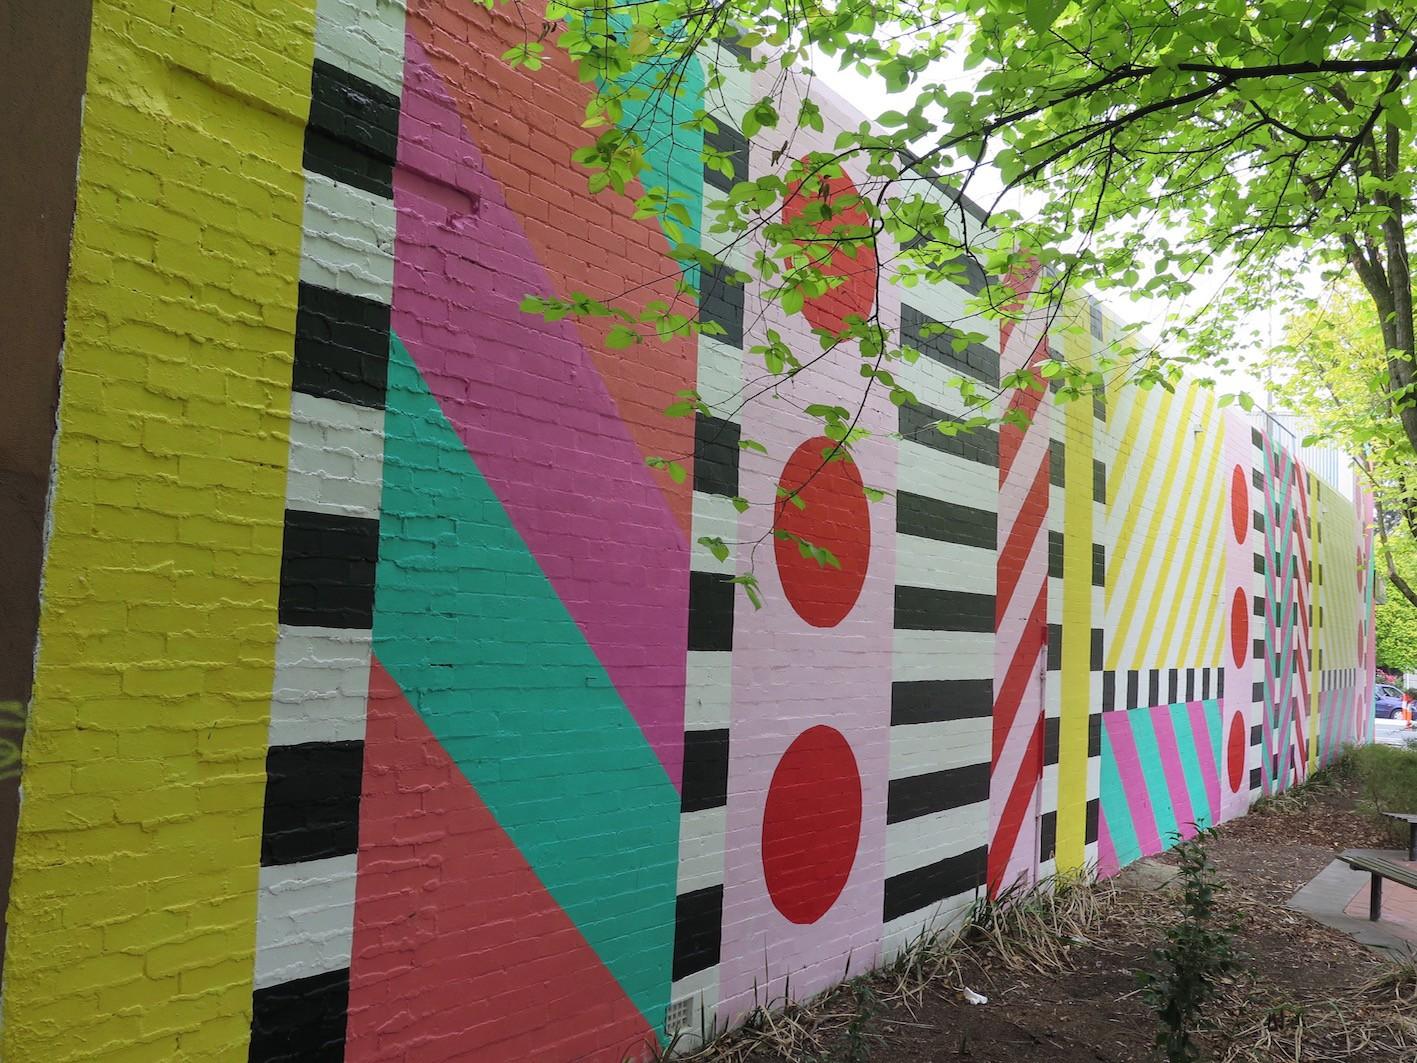 deansunshine_landofsunshine_melbourne_streetart_graffiti_eastland urban art project 4 camille walala 1